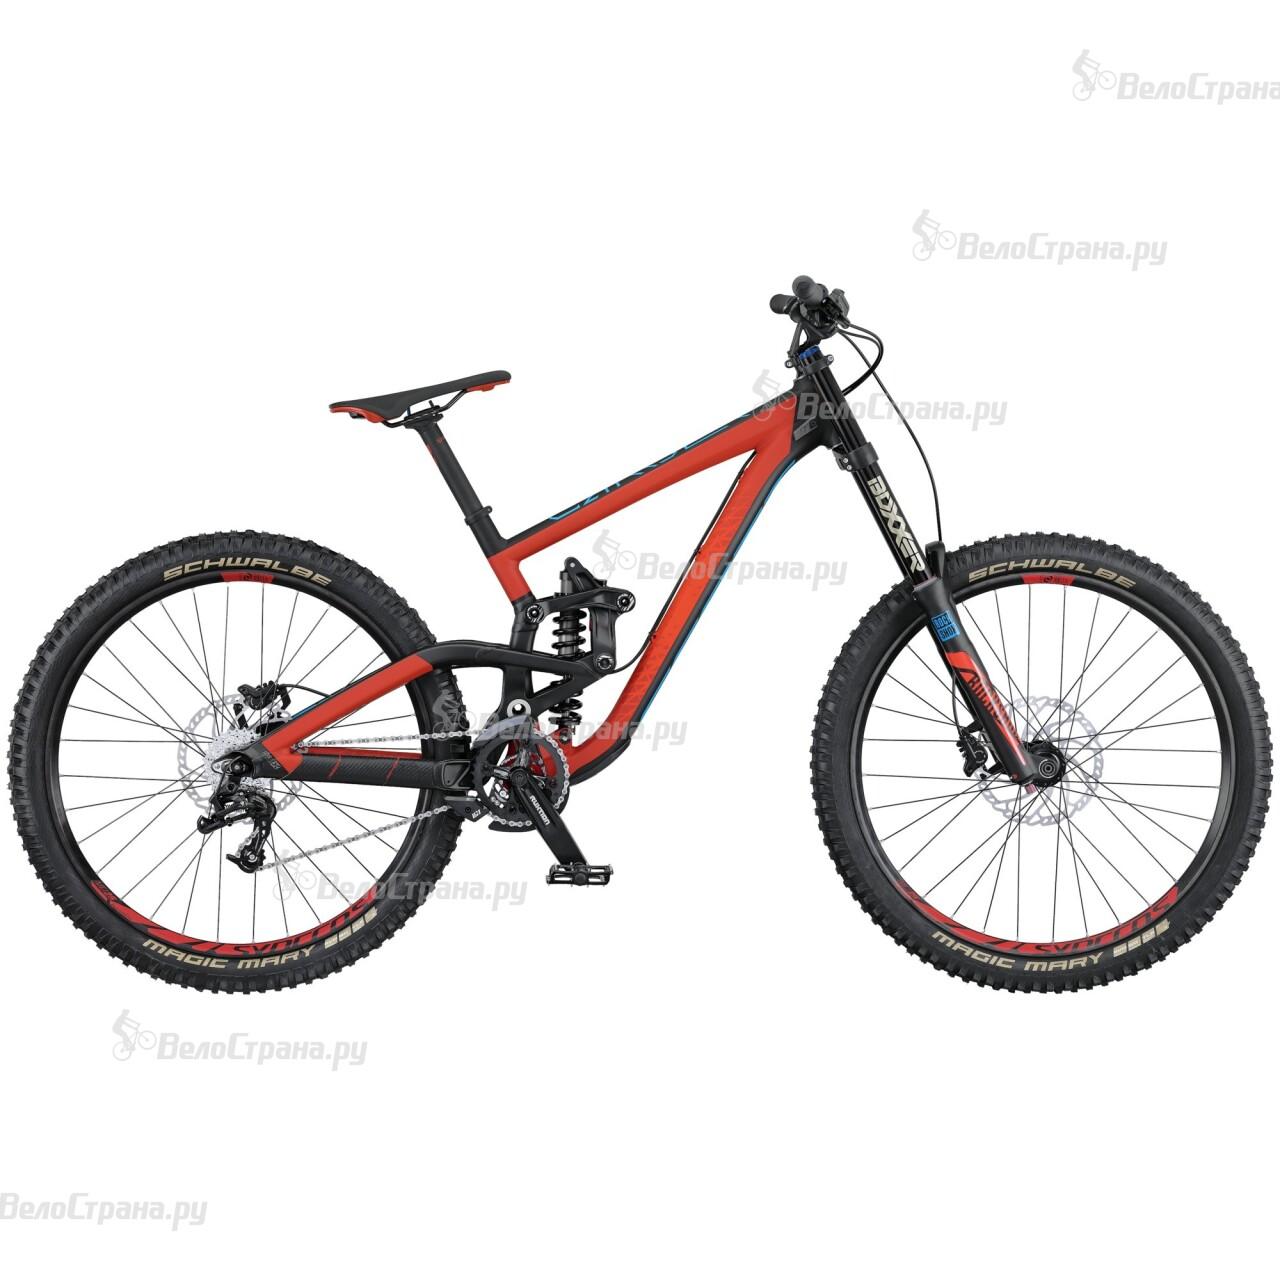 Велосипед Scott GAMBLER 730 (2016) велосипед scott gambler 720 2015